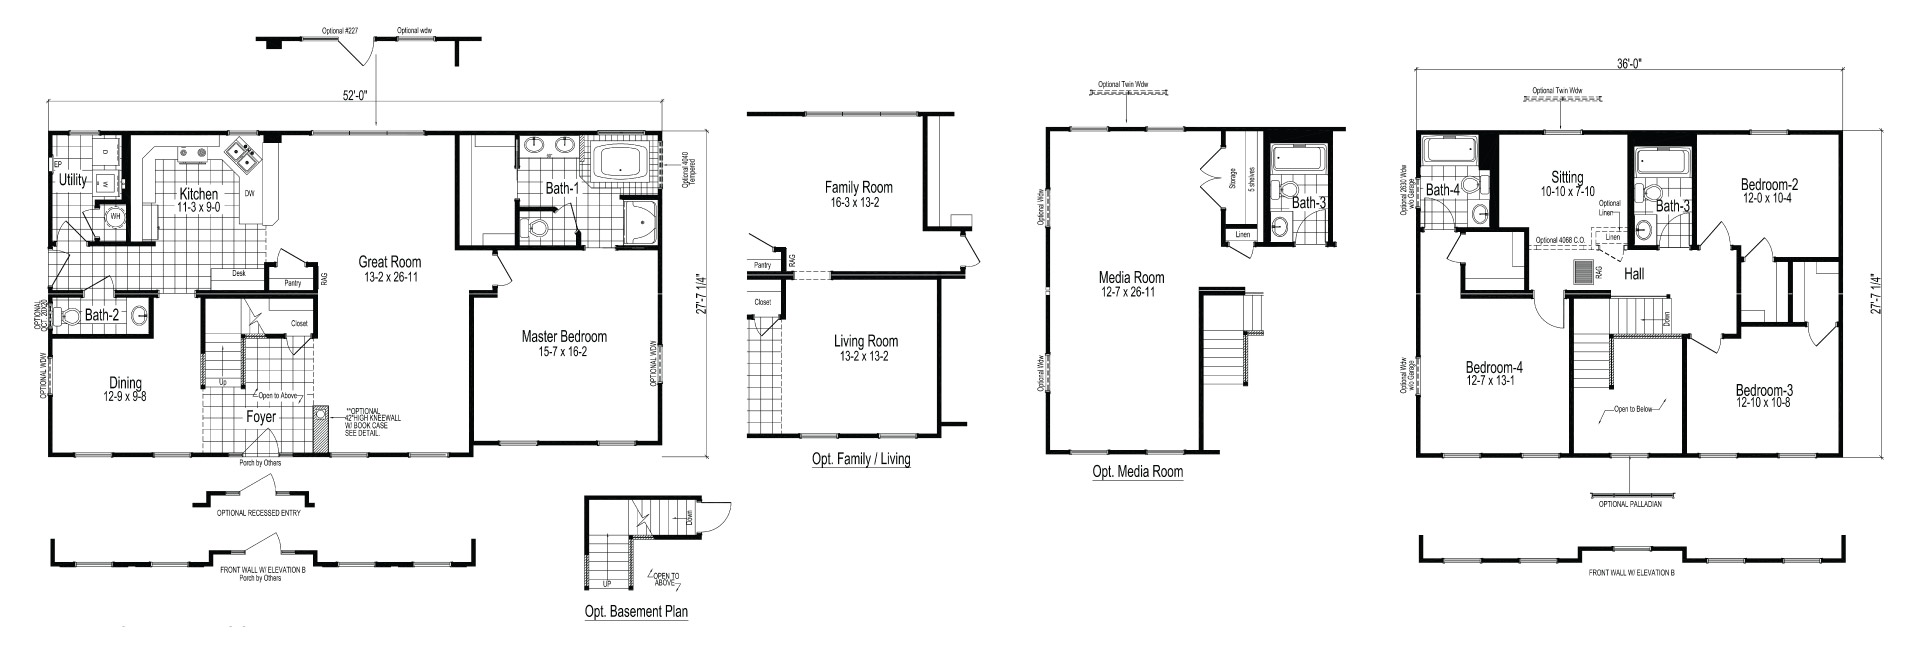 Haywood II Modular Home Floor Plan